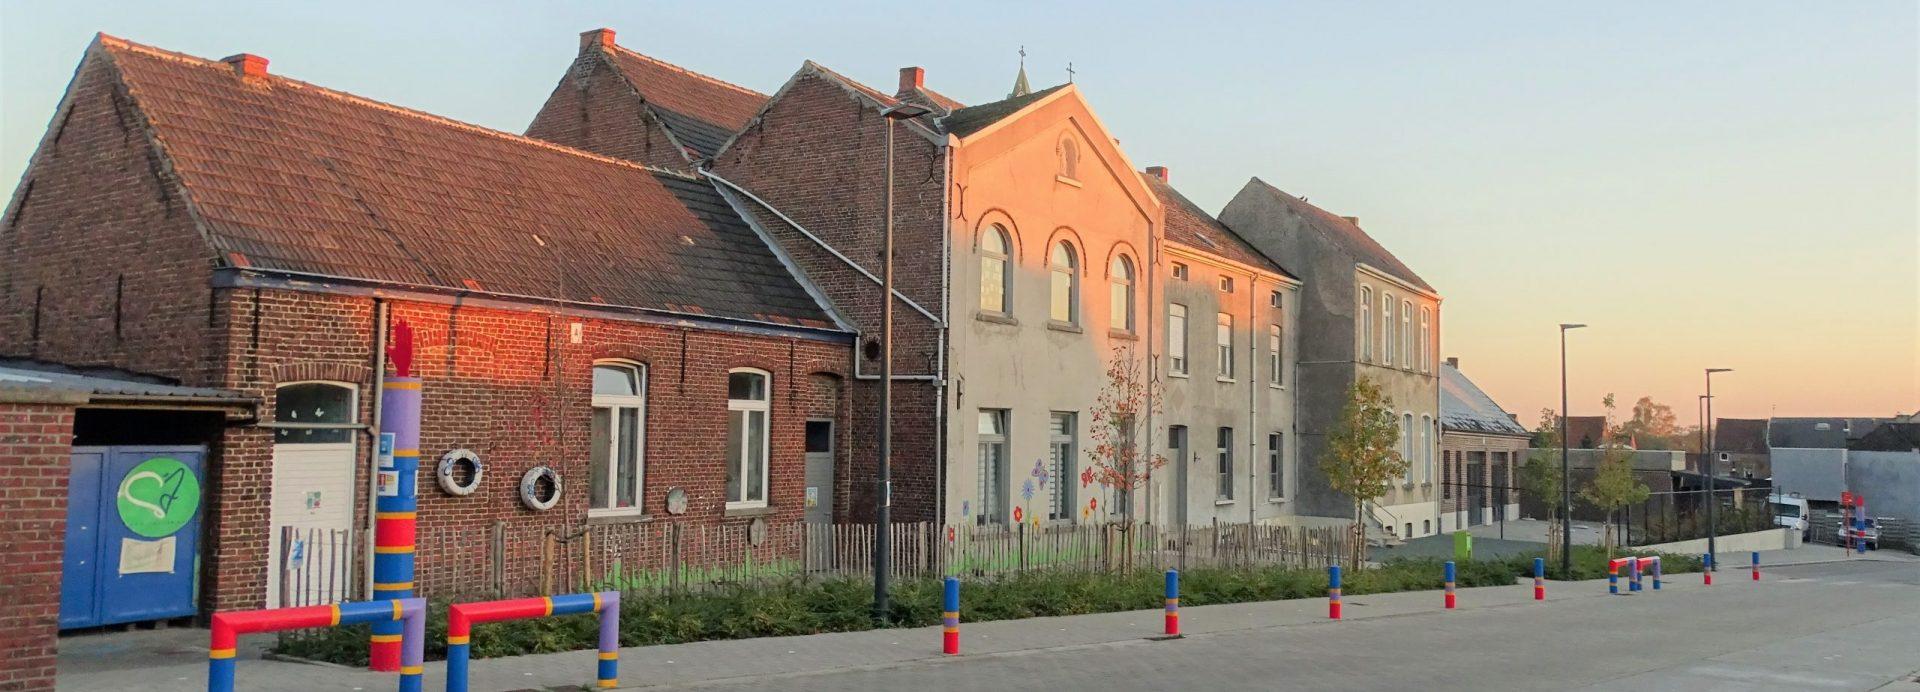 Basisschool St. Jan Teralfene